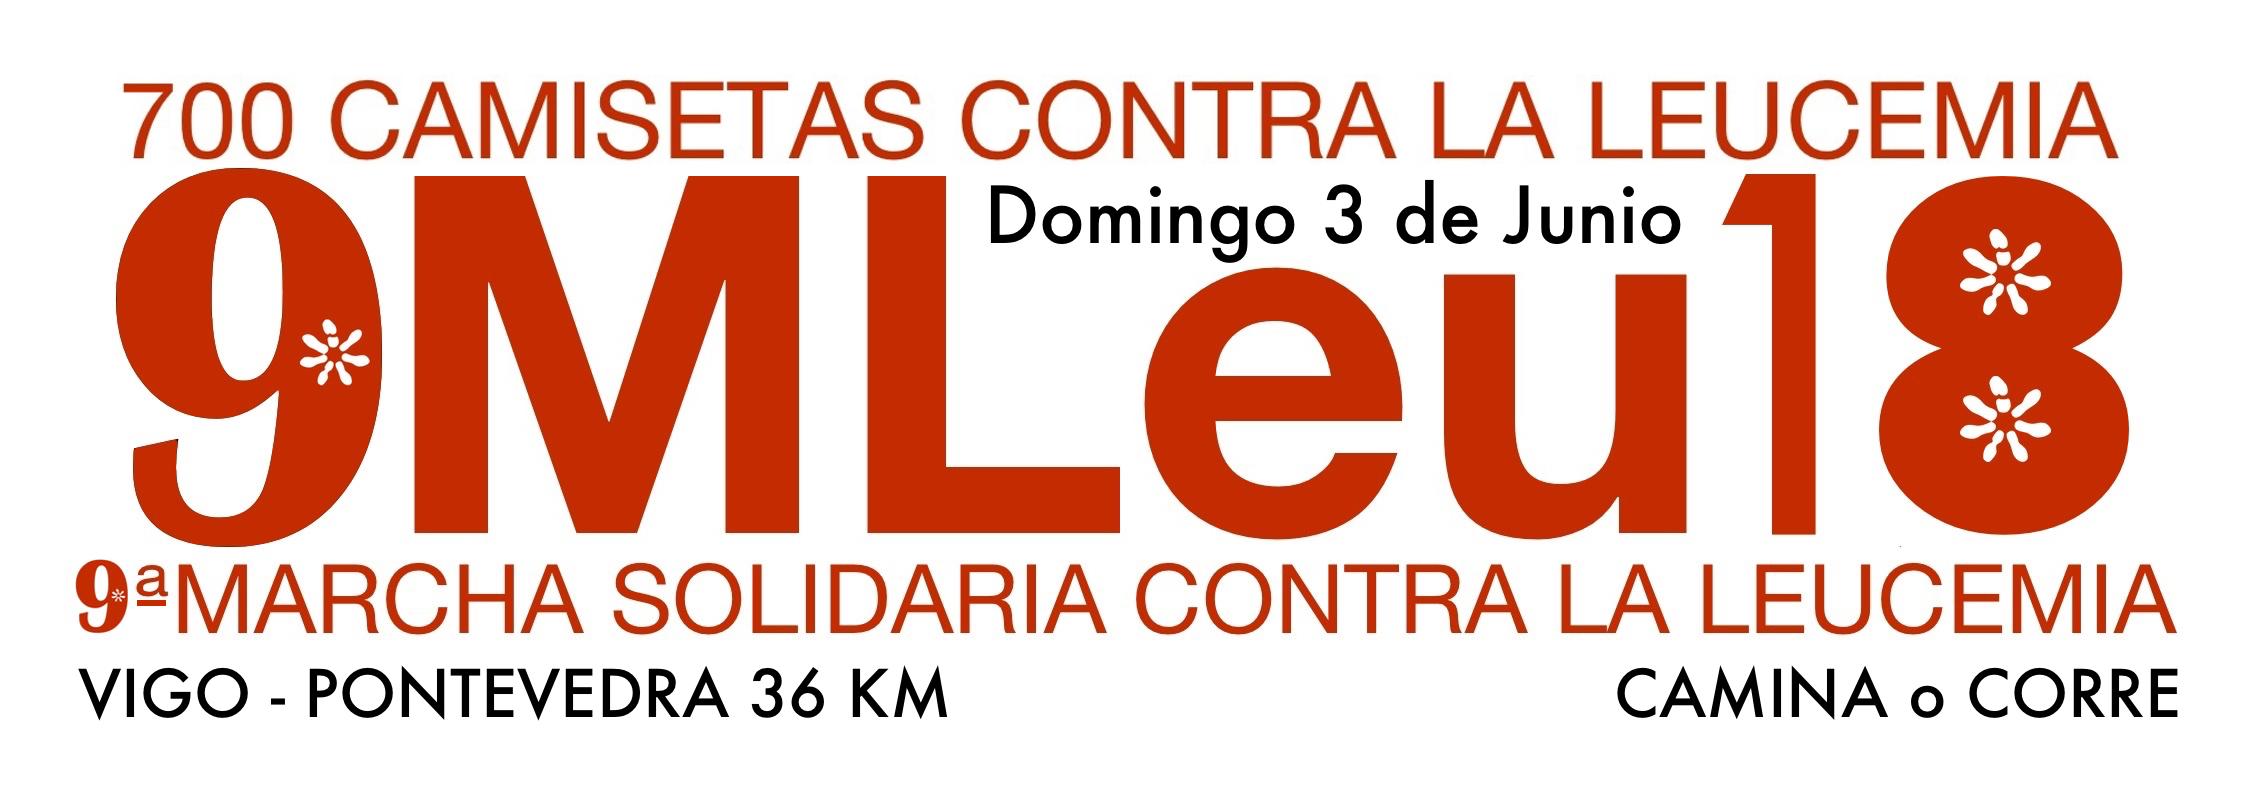 IX MARCHA SOLIDARIA 700 CAMISETAS CONTRA LA LEUCEMIA